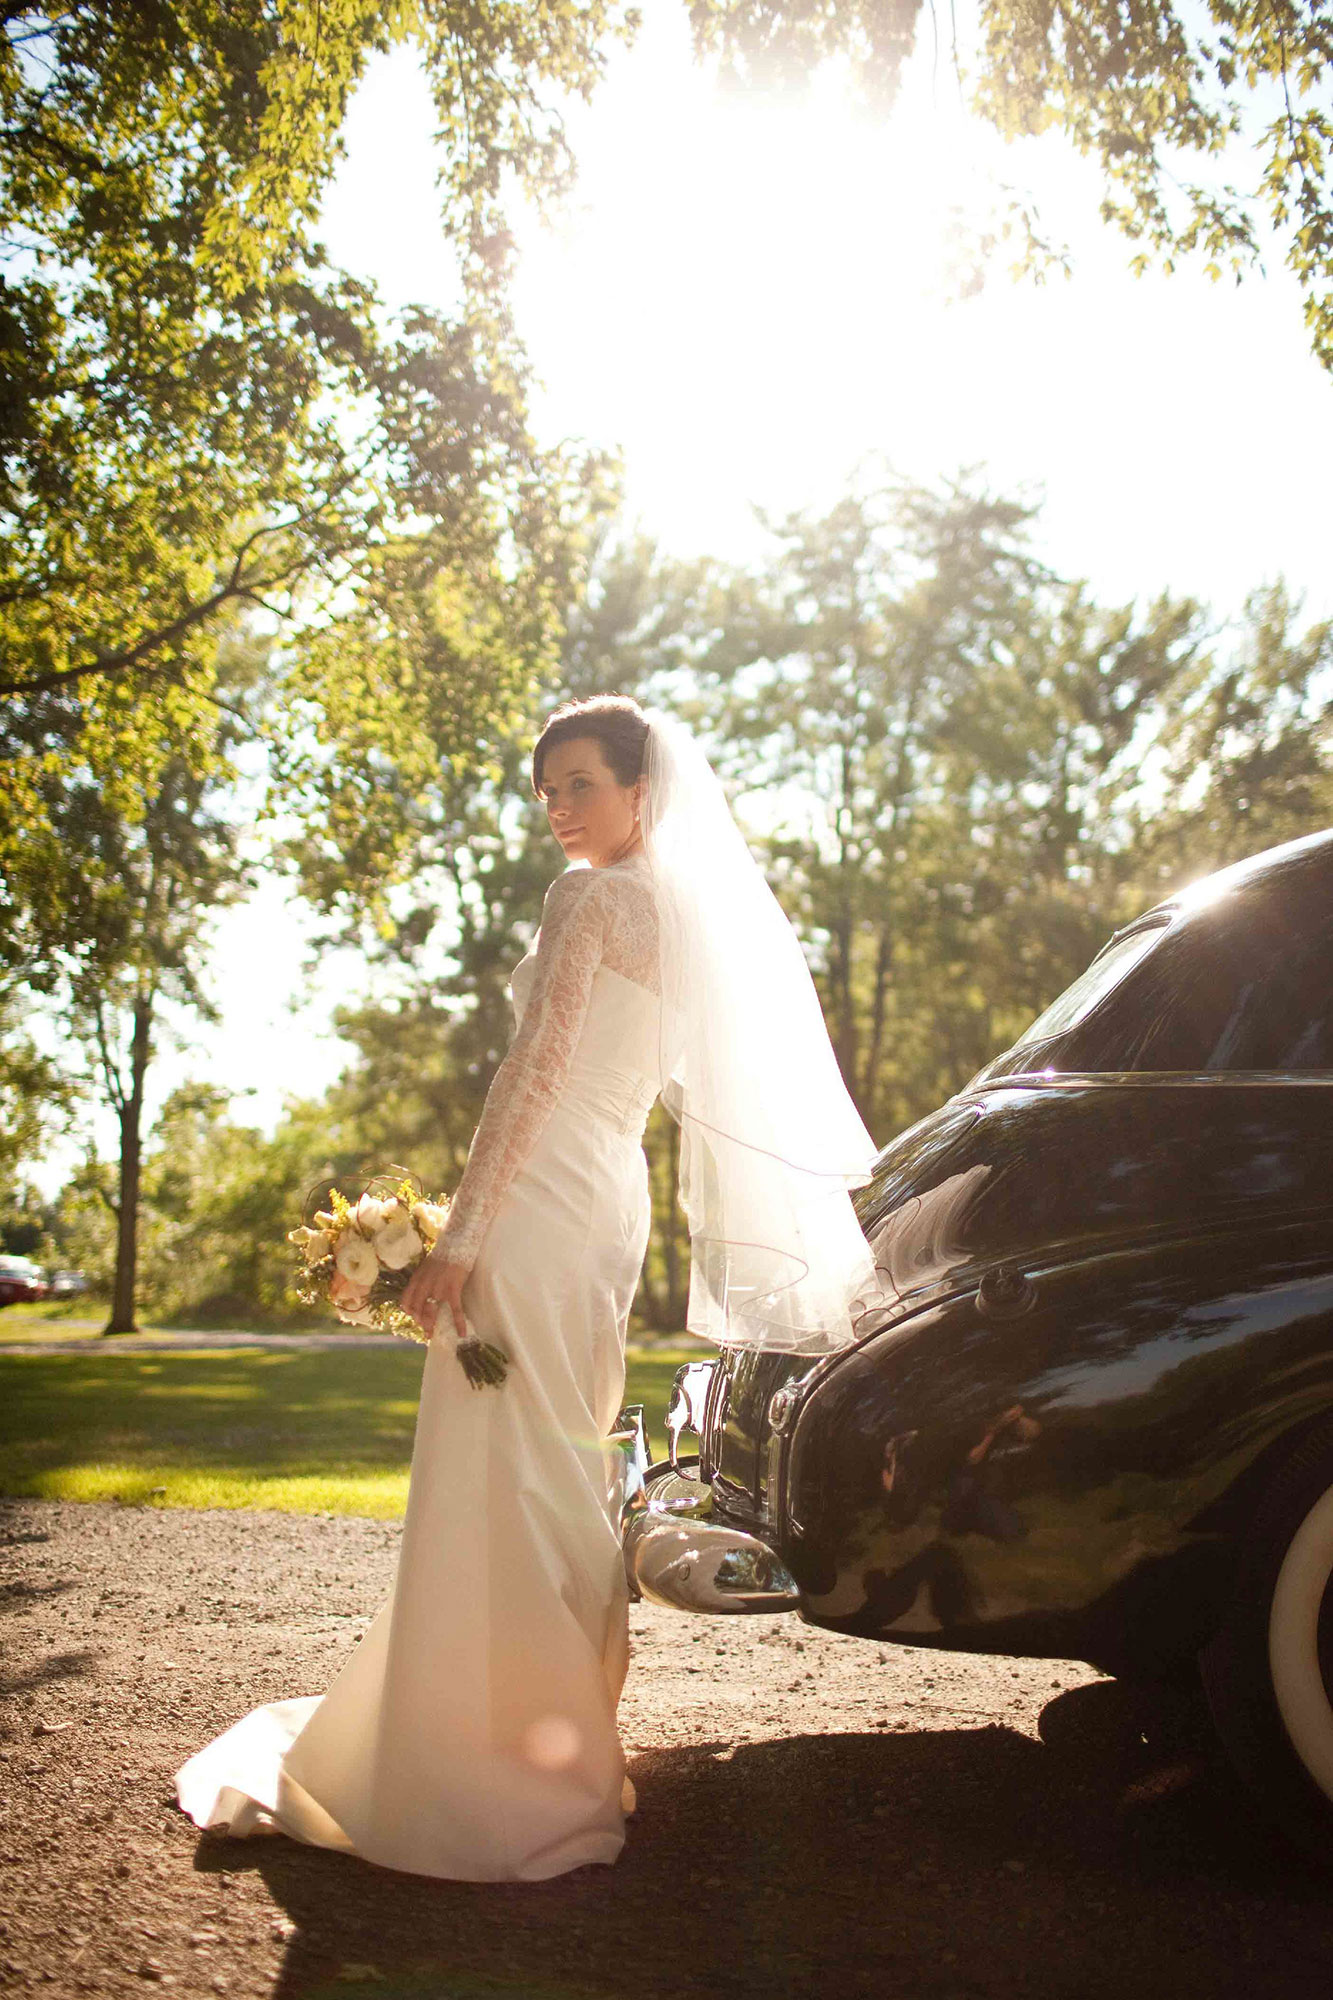 Amanda-Cowley-Willowbank-Vineyard-Bride-Photo-By-White-Photographie-026.jpg